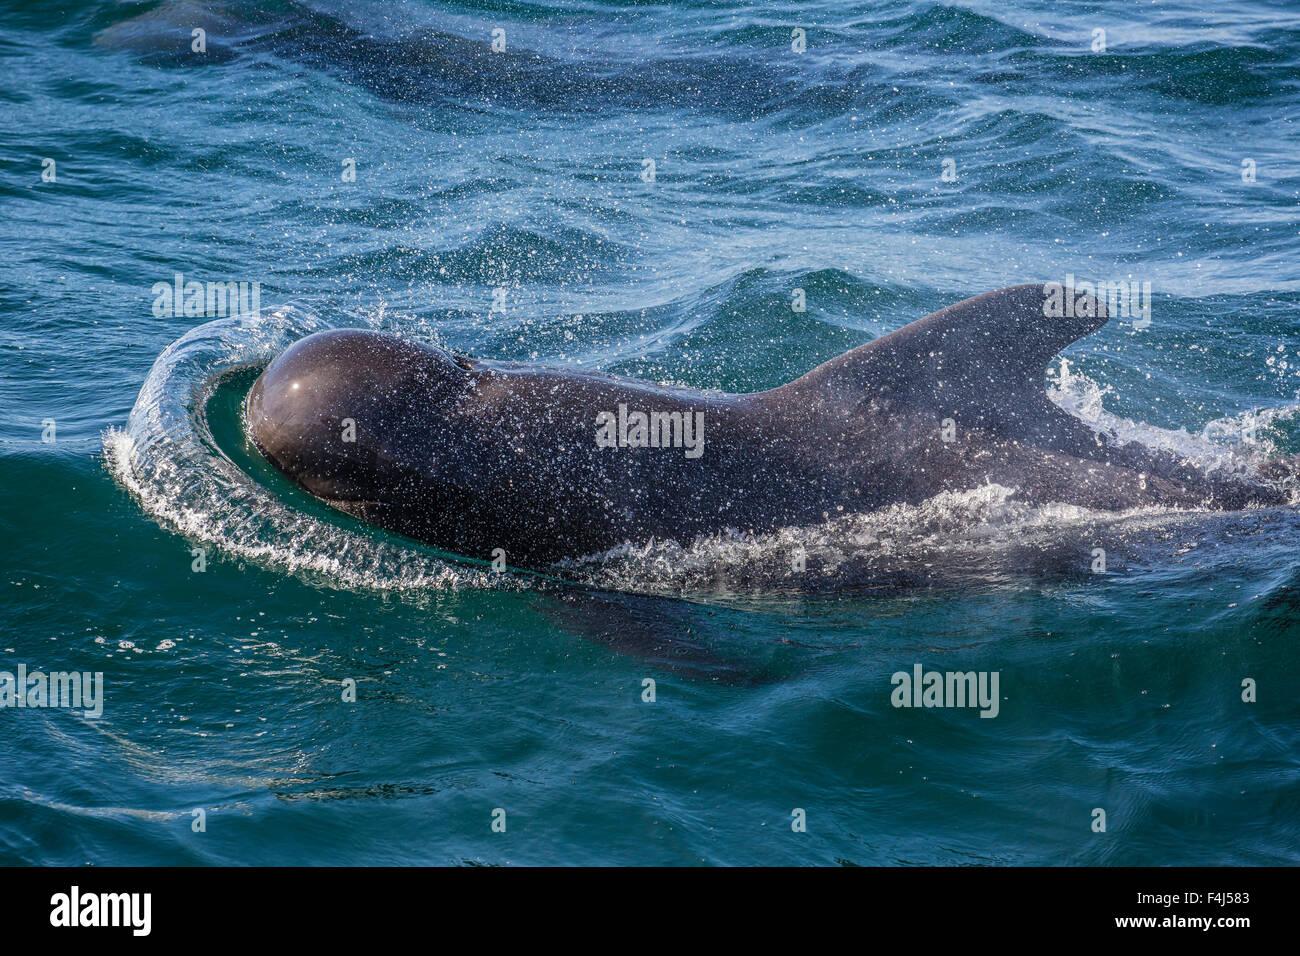 Short-finned pilot whale (Globicephala macrorhynchus) surfacing near Isla San Pedro Martir, Baja California, Mexico Stock Photo